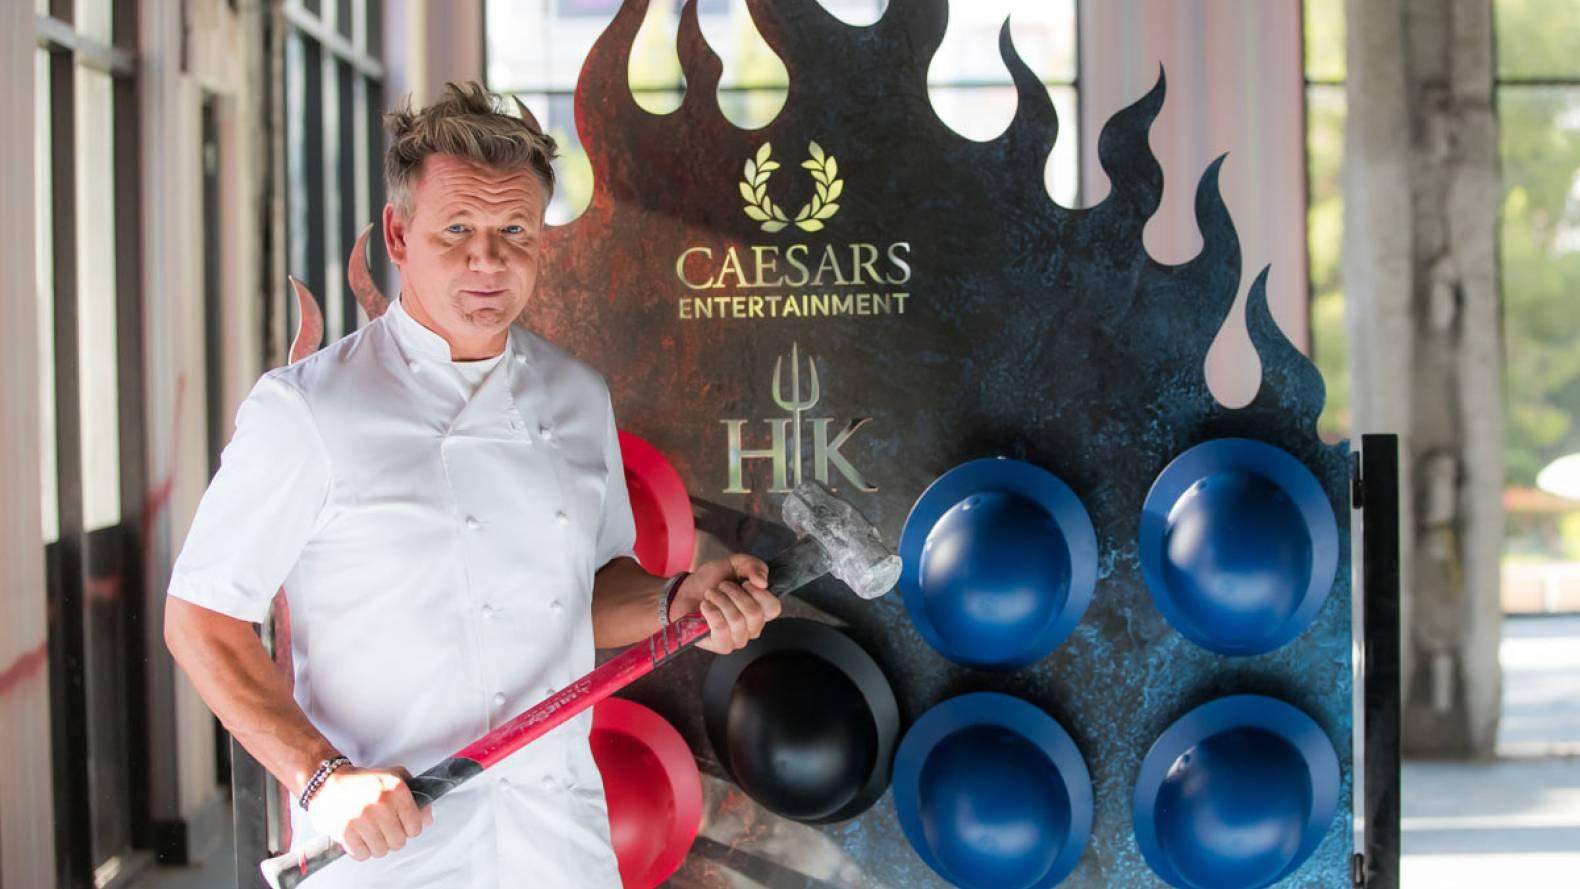 Hell's Kitchen Restaurant - Caesars Palace | Gordon Ramsay Restaurants